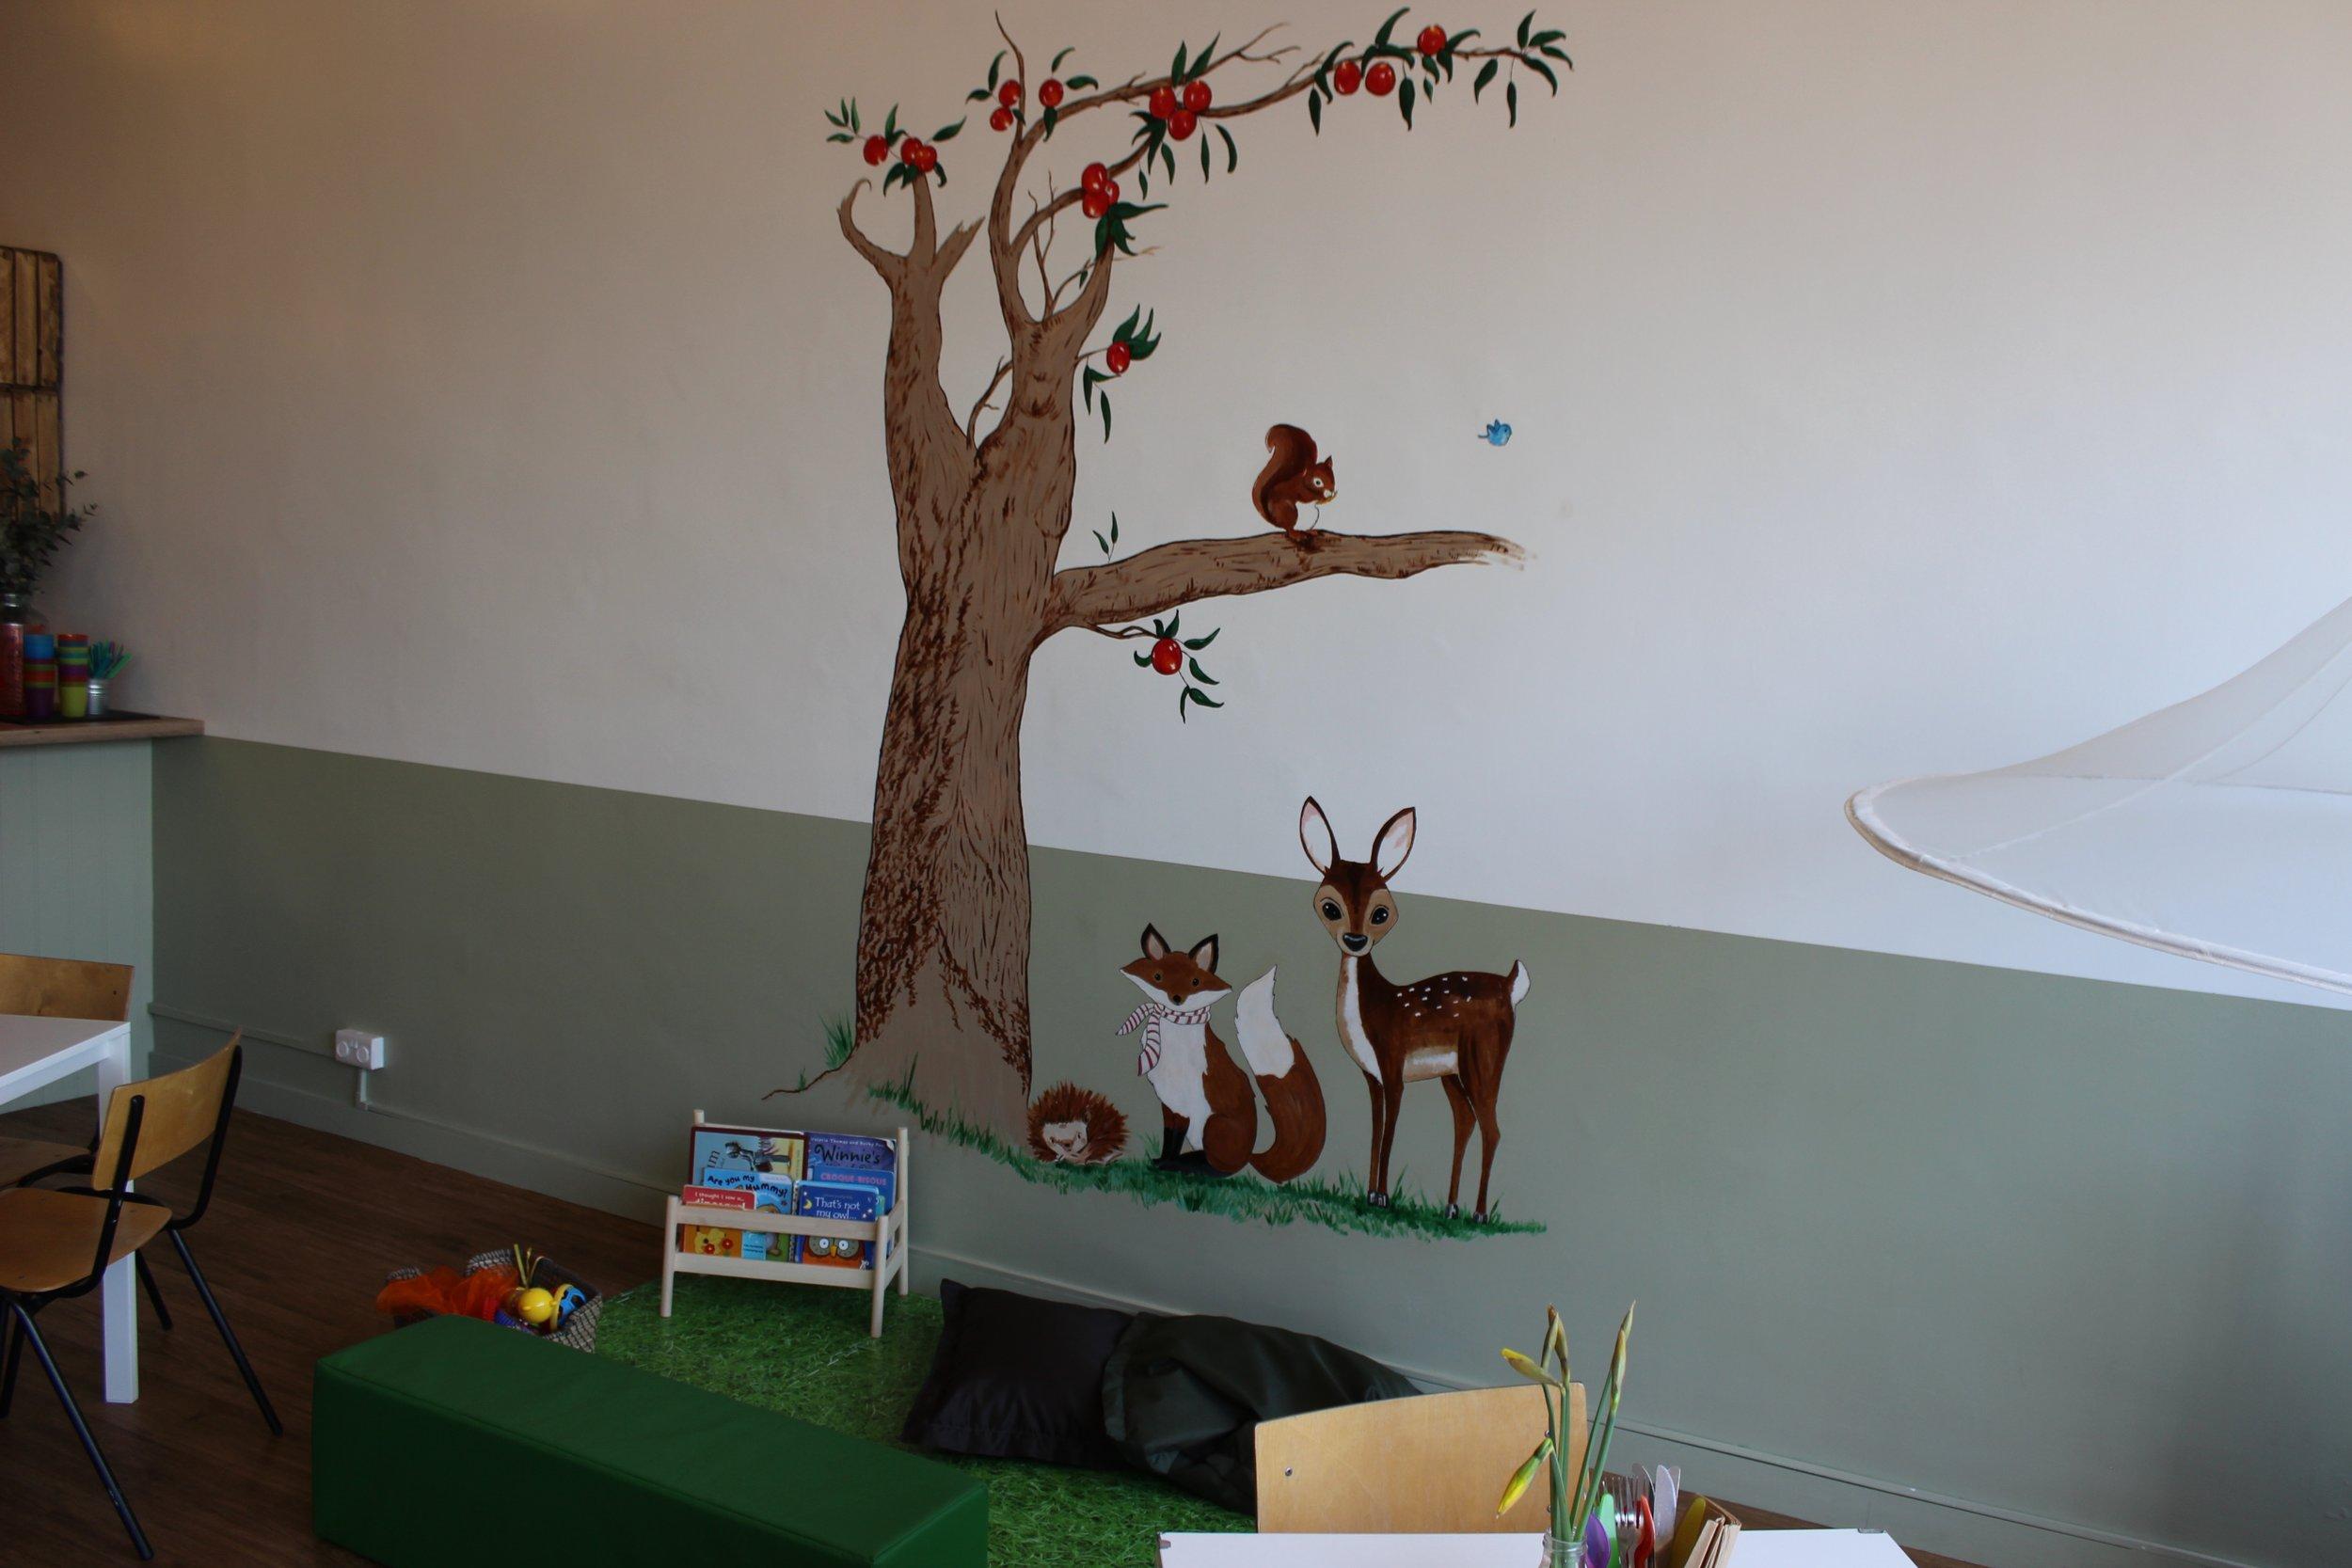 Apple Tree Children's Cafe in Herne Hill South London 4.jpg